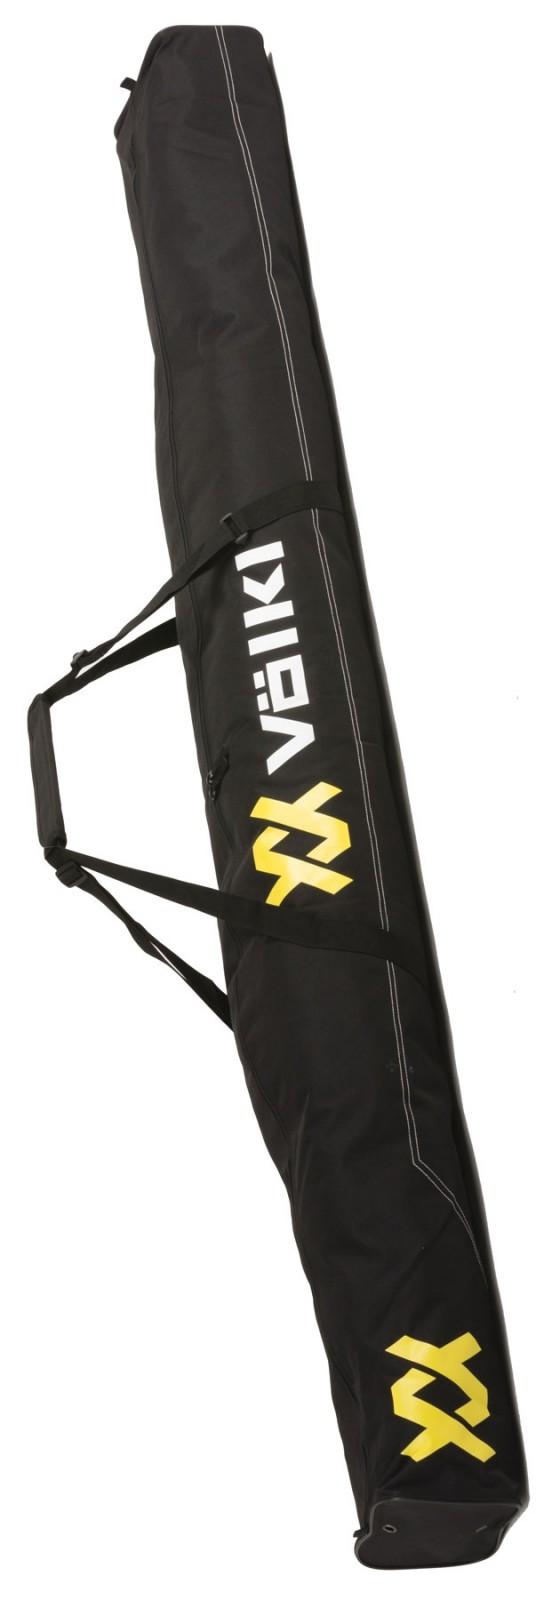 Völkl Classic Double Ski Bag 195 cm